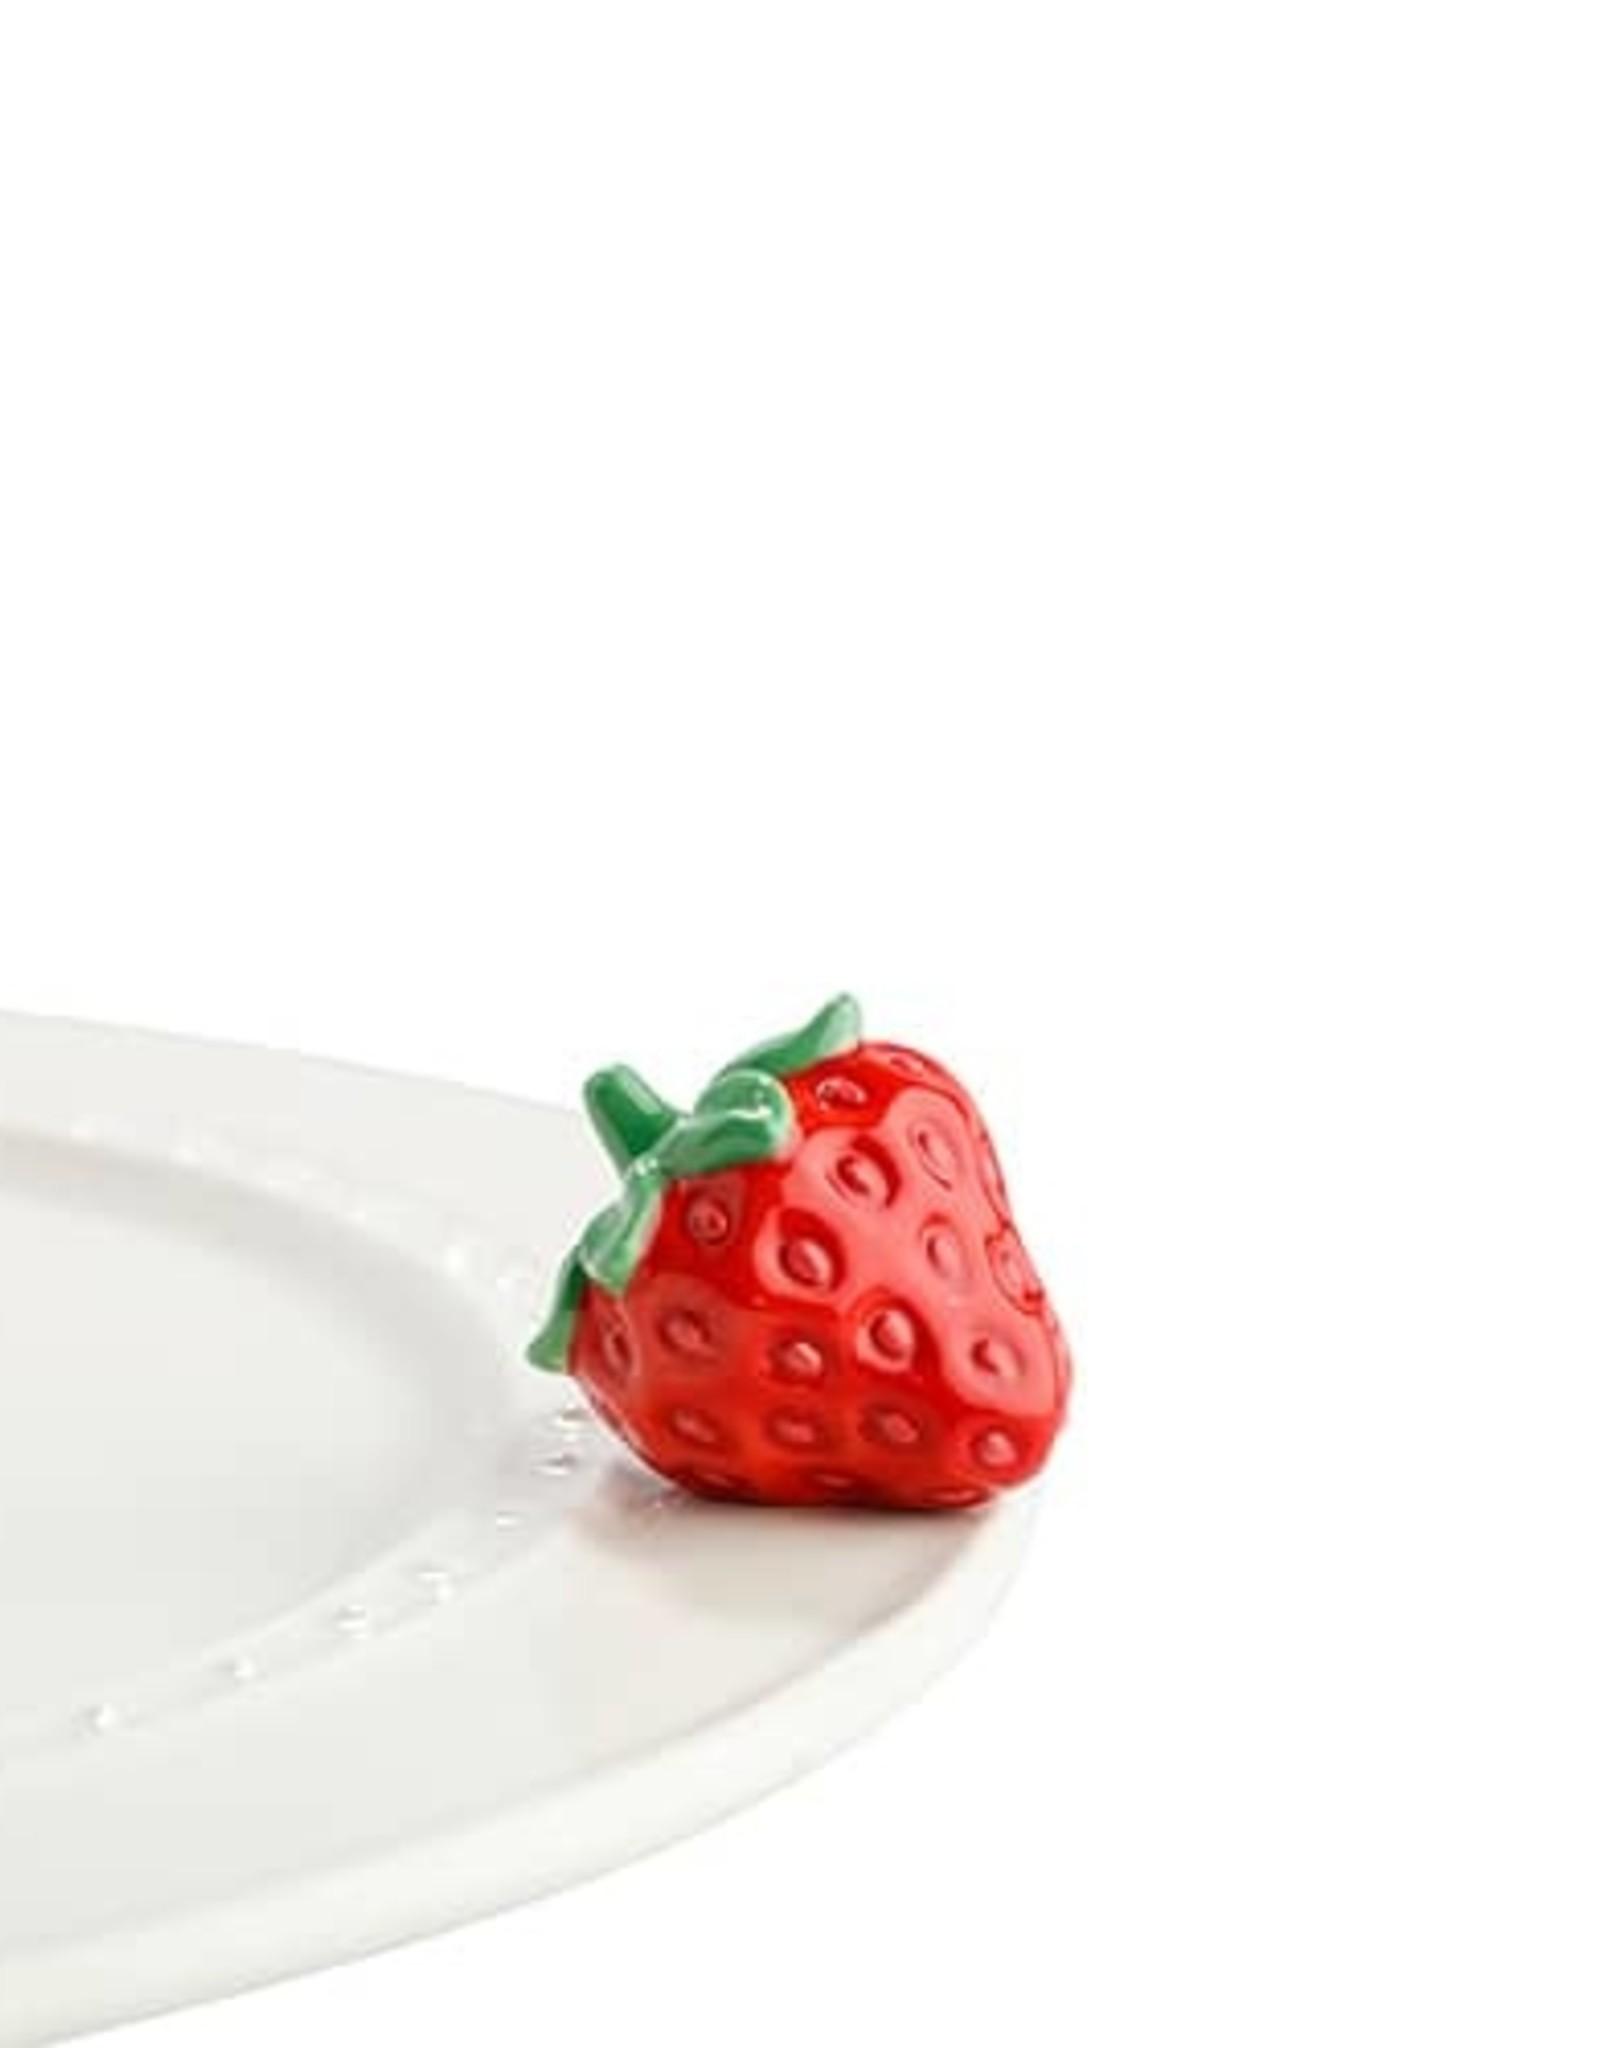 Nora Fleming A142 Juicy Fruit